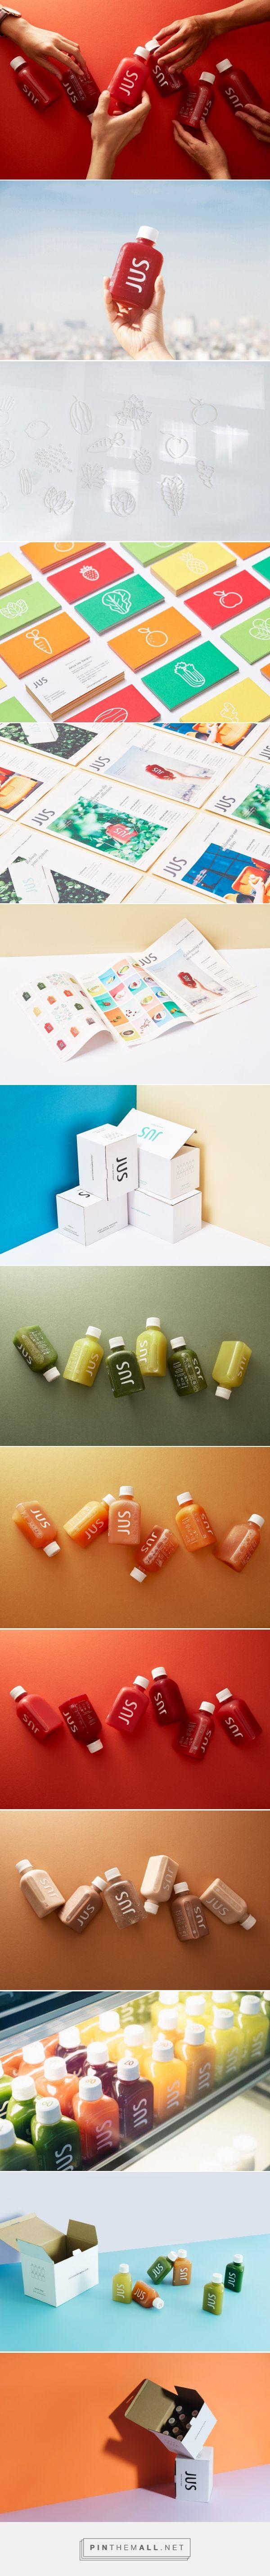 JUS • Juice Up Saigon packaging design by M - N Associates - http://www.packagingoftheworld.com/2017/11/jus-juice-up-saigon.html